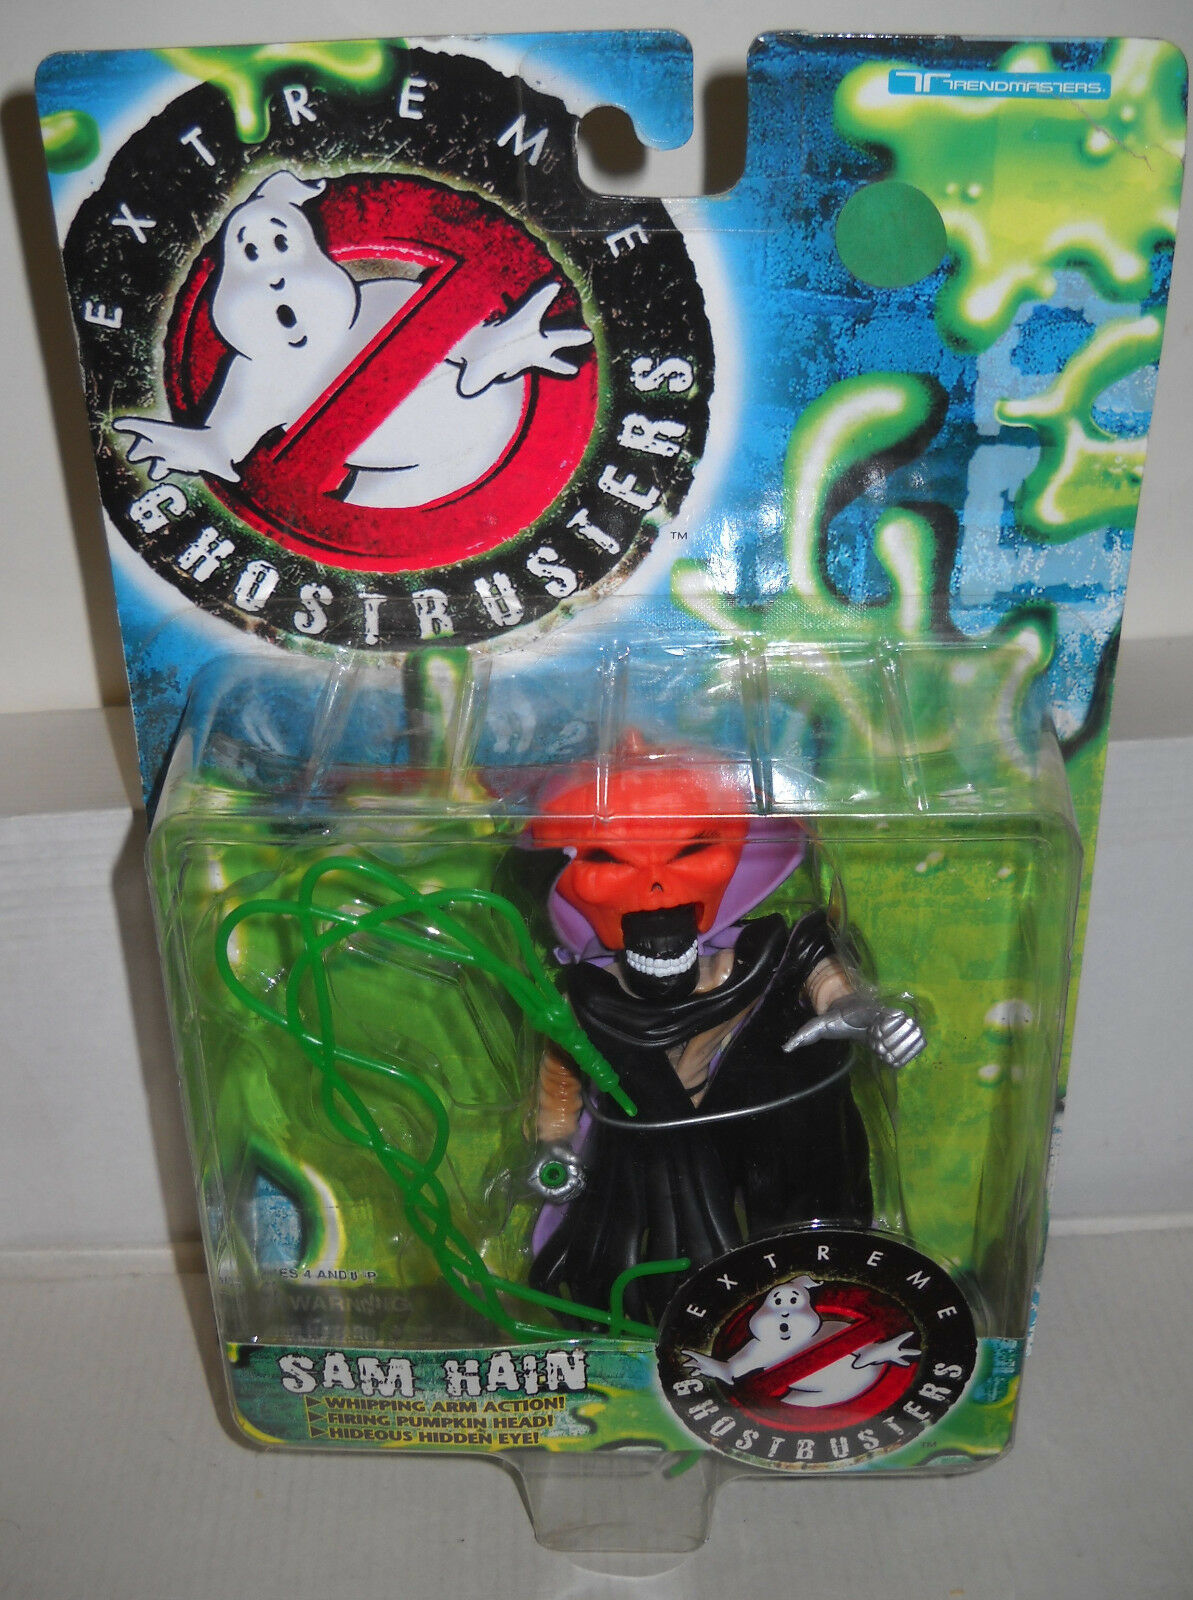 5955 NRFC Trendmasters Extreme Ghostbusters Sam Hain Figure